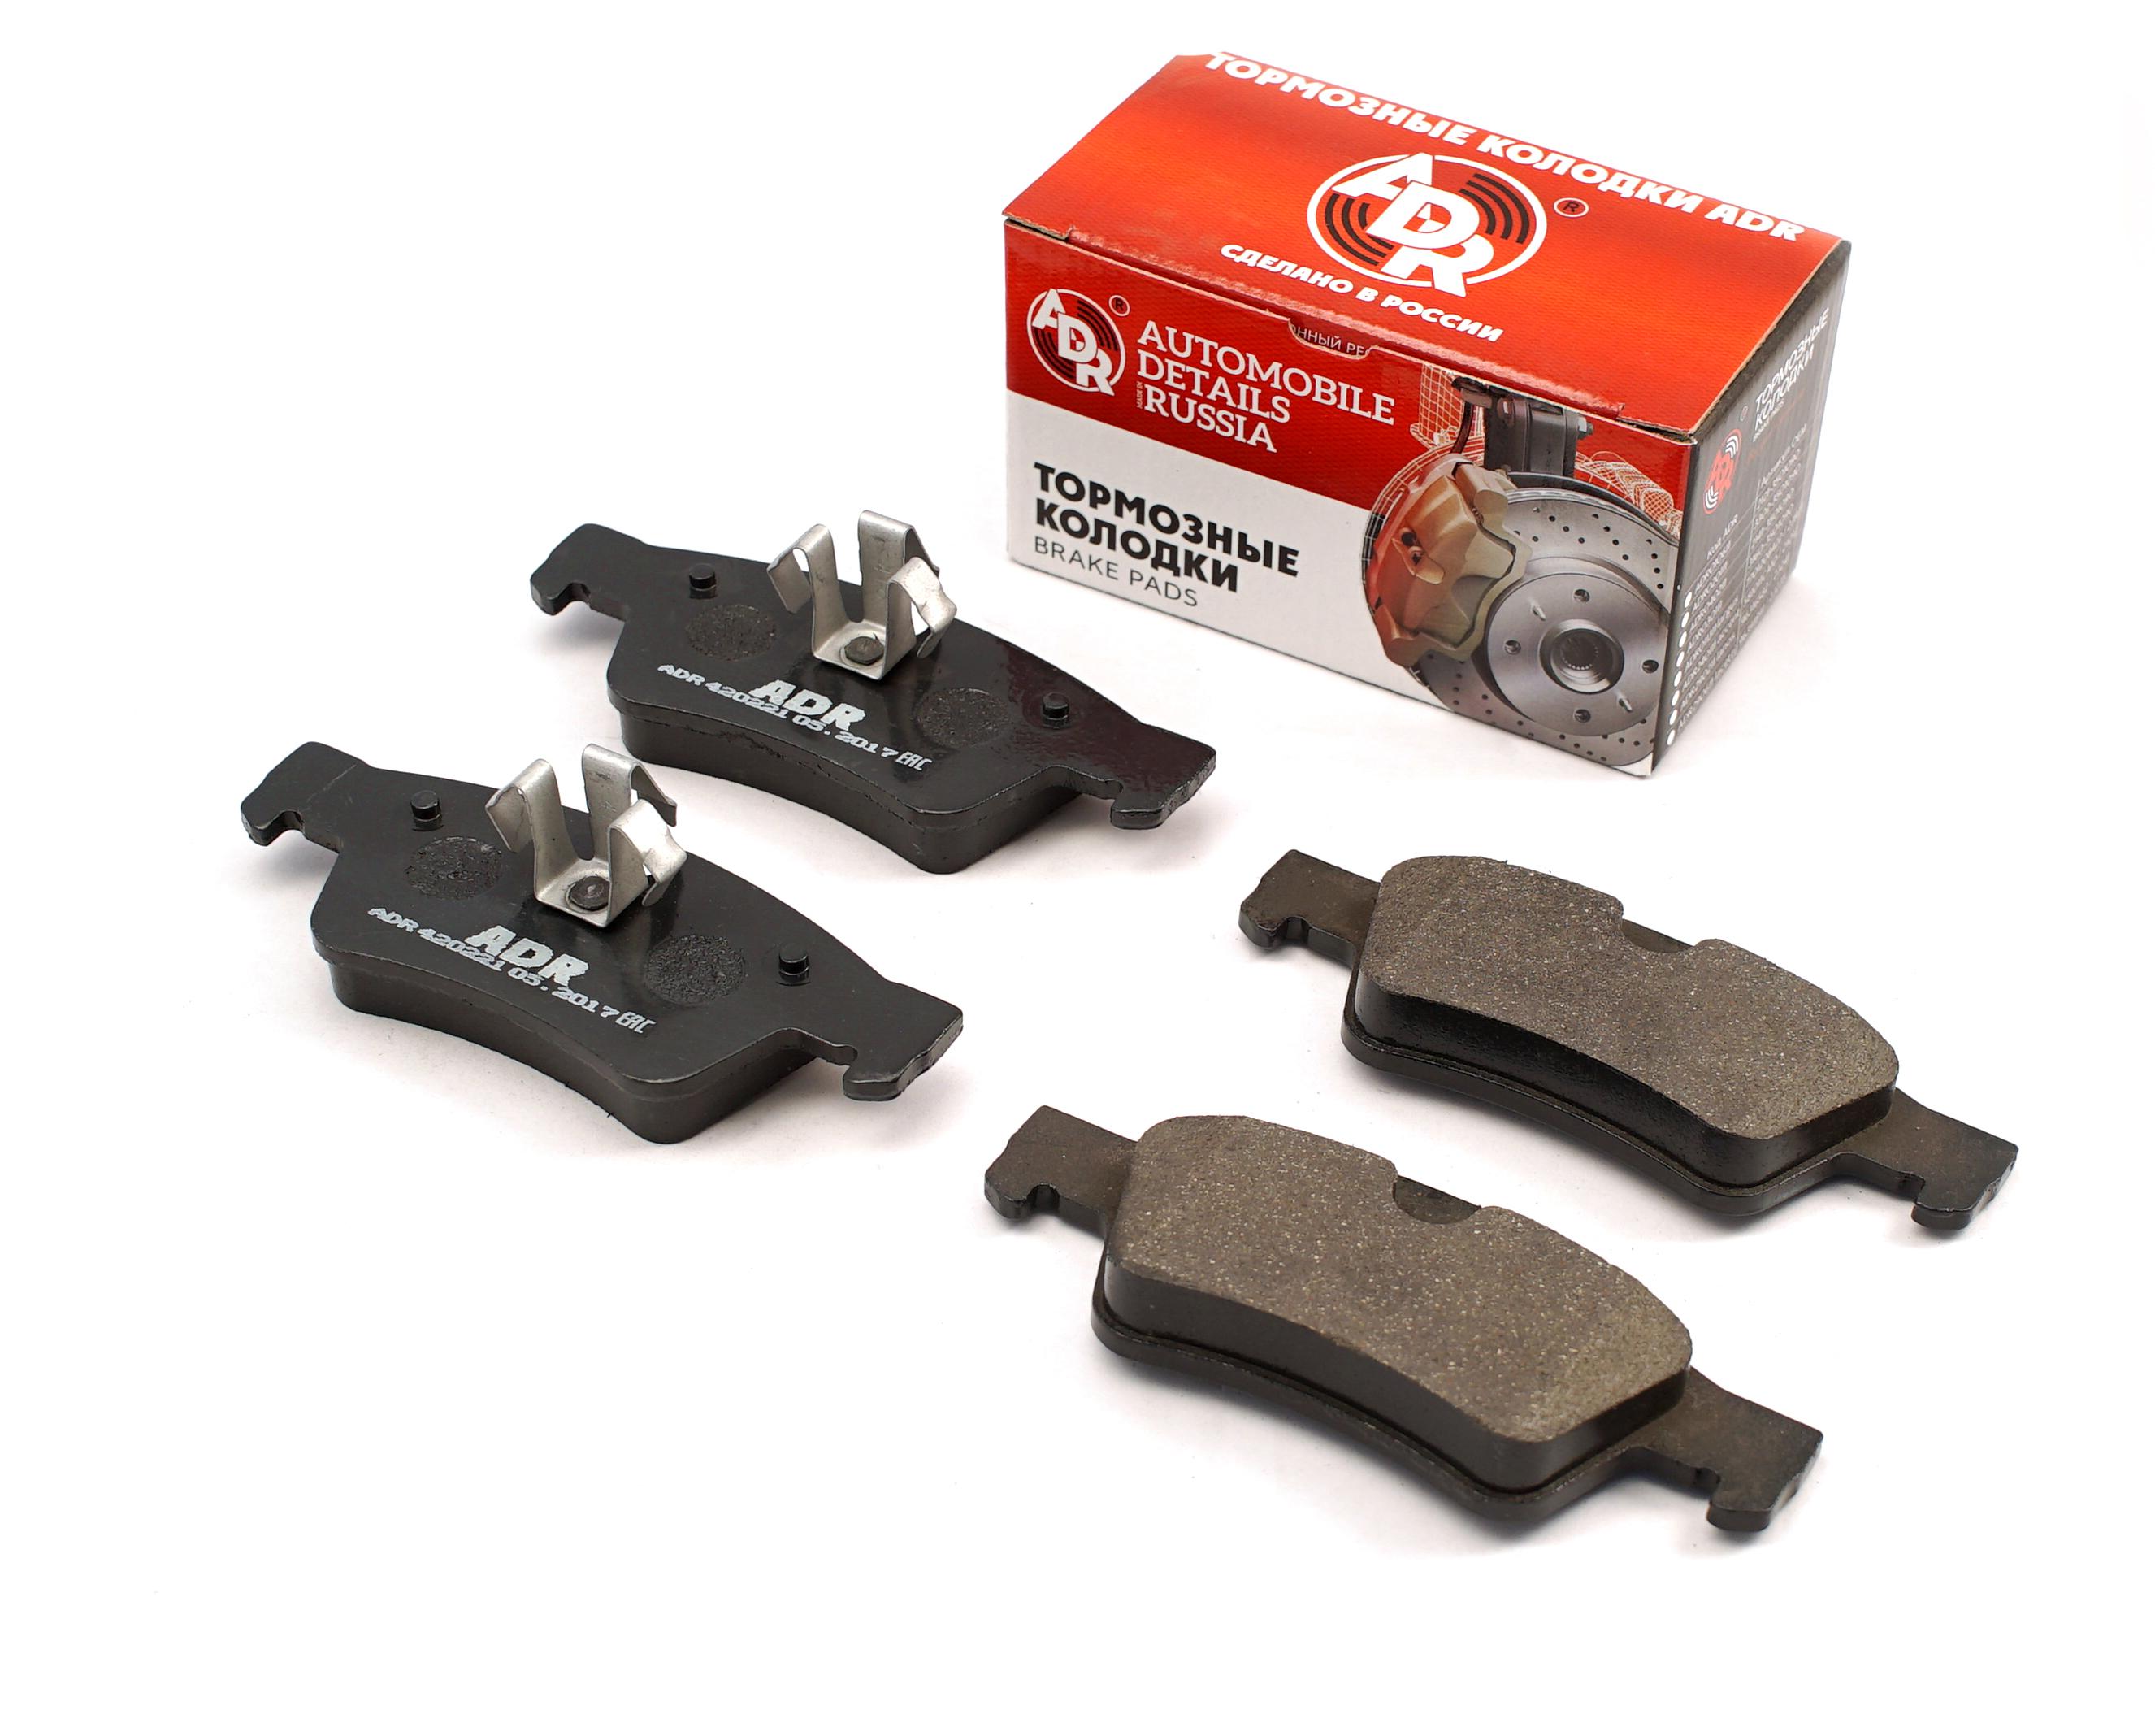 ADR420221 ADR Колодки тормозные задние MERCEDES G III, GL, ML II, III, R OEM A1644201520